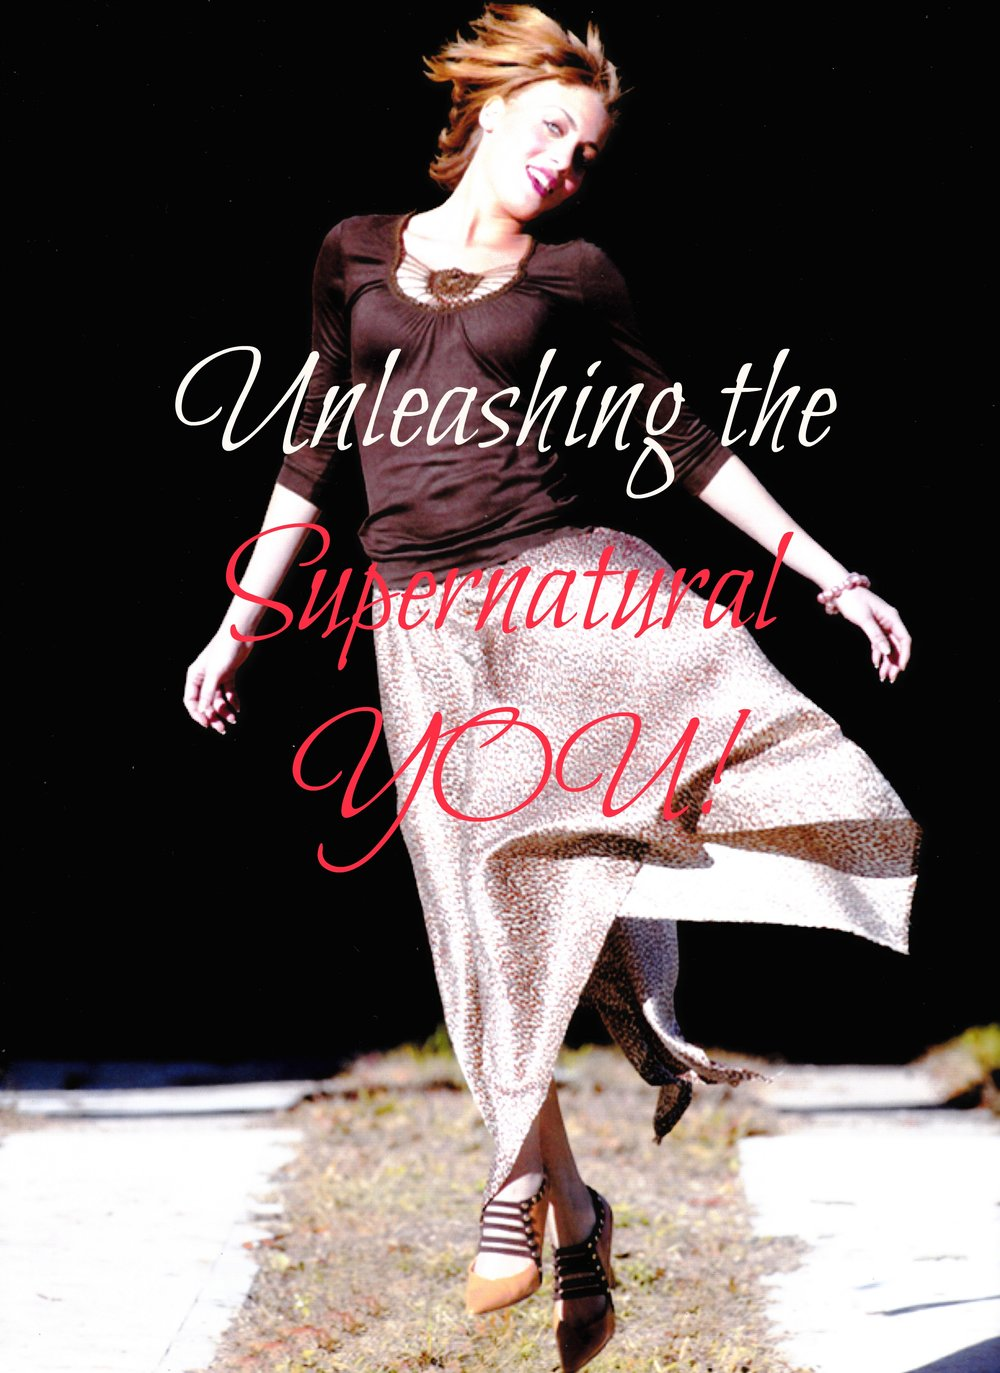 Unleashing-the-supernatural-you.jpg